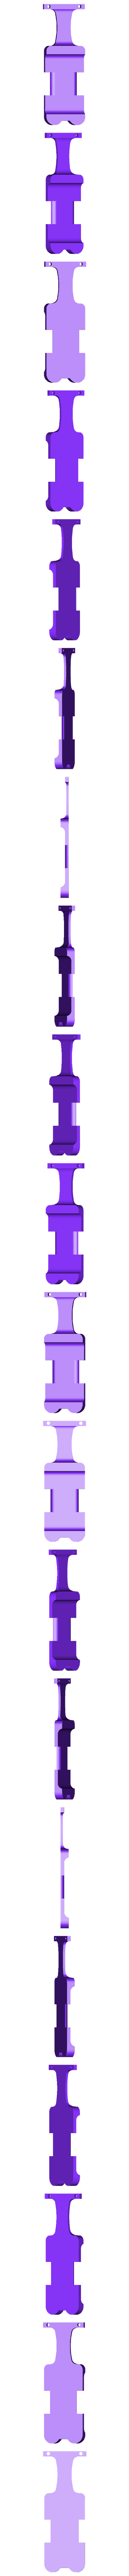 X210LiPoLock_v1.stl Download free STL file QAV-X 210 X210 LiPo battery protector • 3D printer object, nik101968